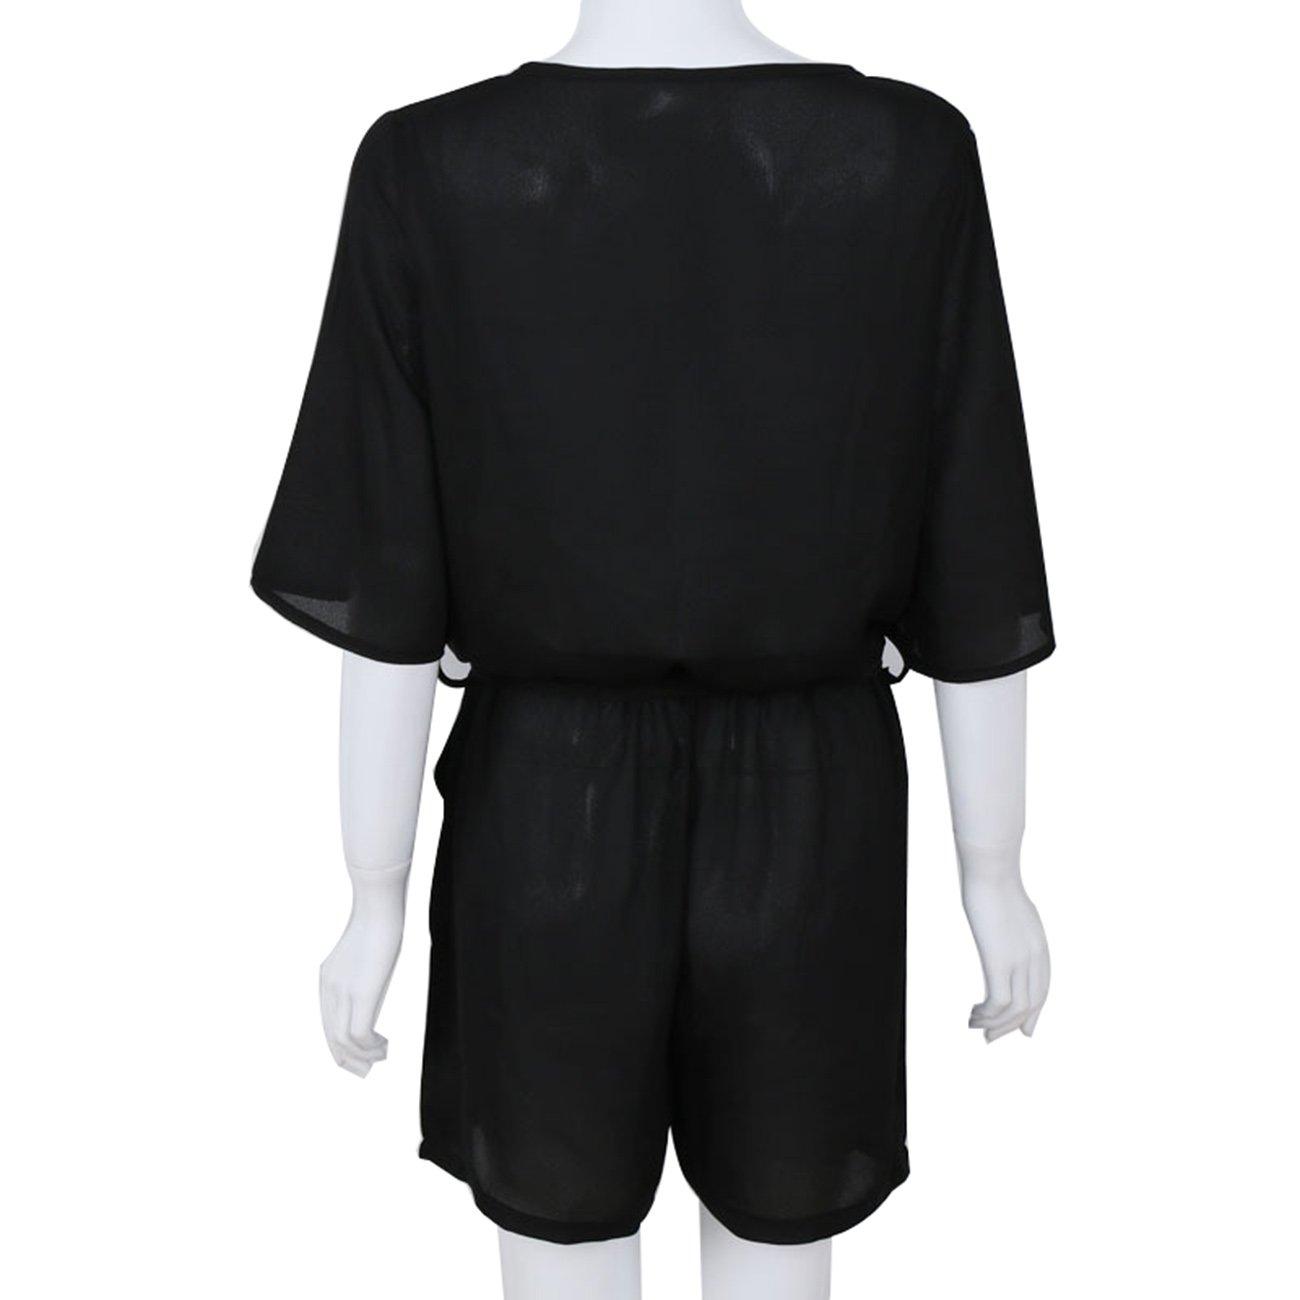 Sumtory Black Romper for Women Flare Sleeve Loose Jumpsuit Short Playsuit M